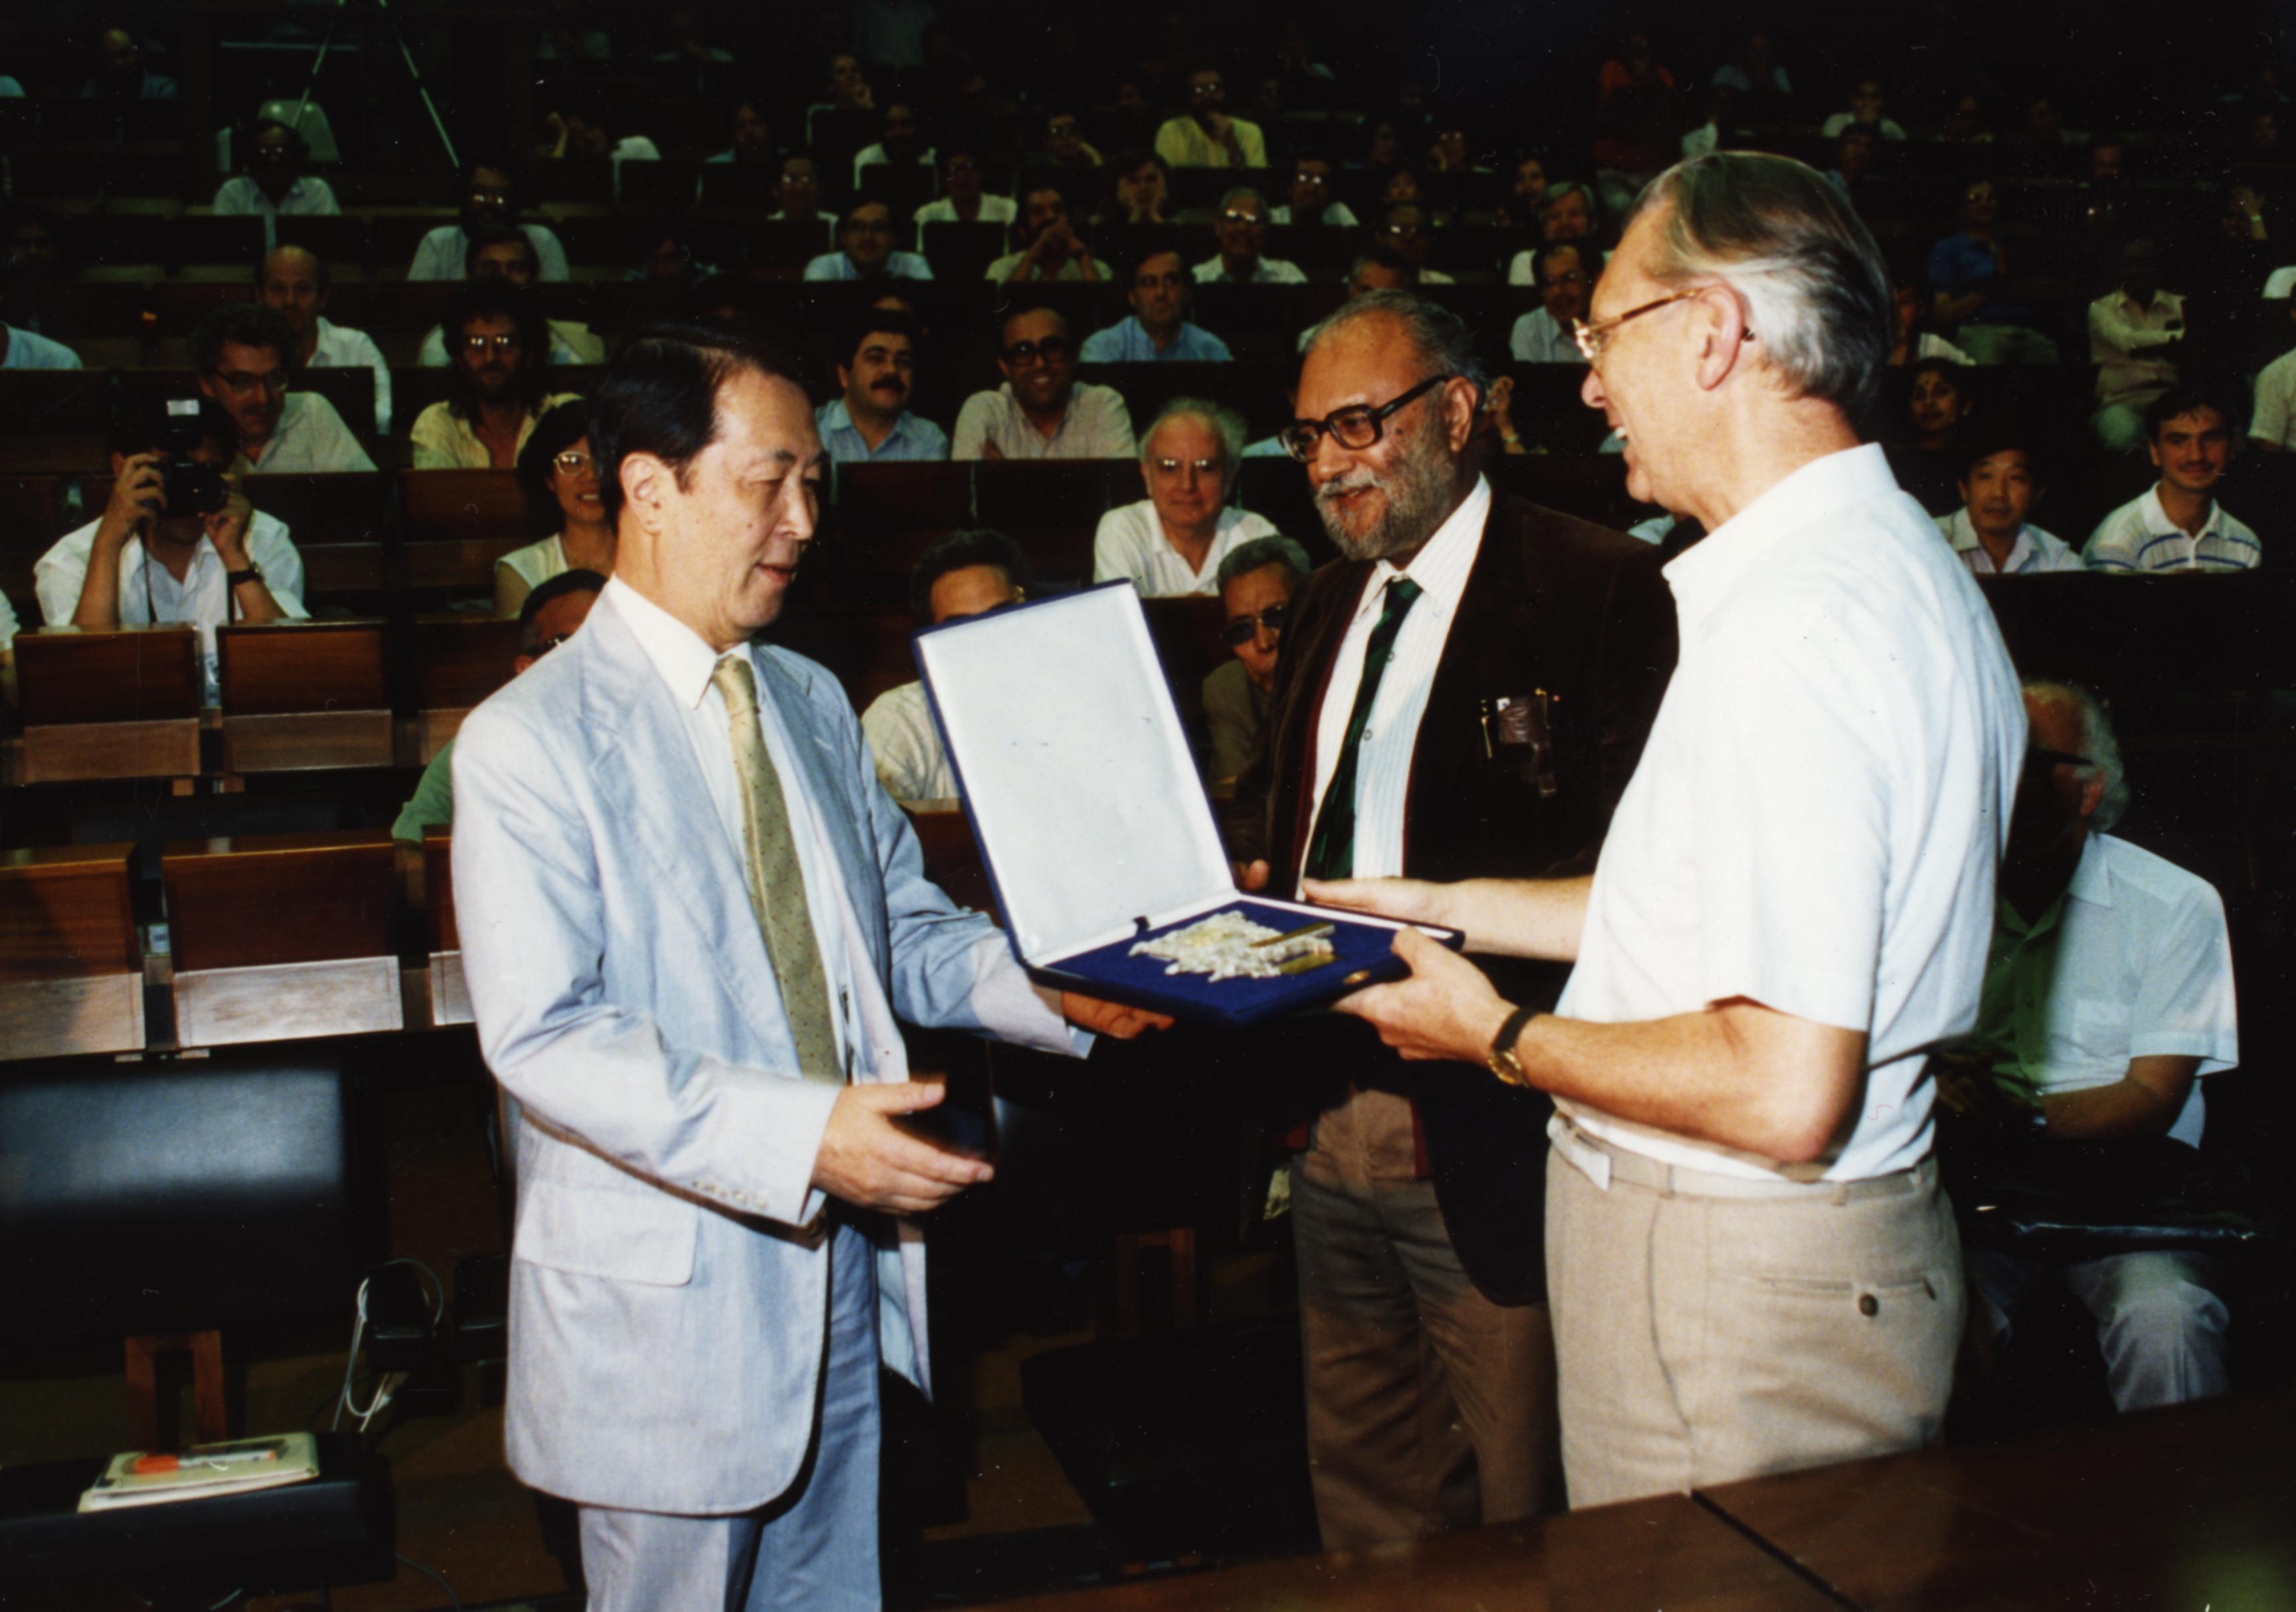 Yoichiro Nambu accepting award from Herwig Schopper and Abdus Salam.